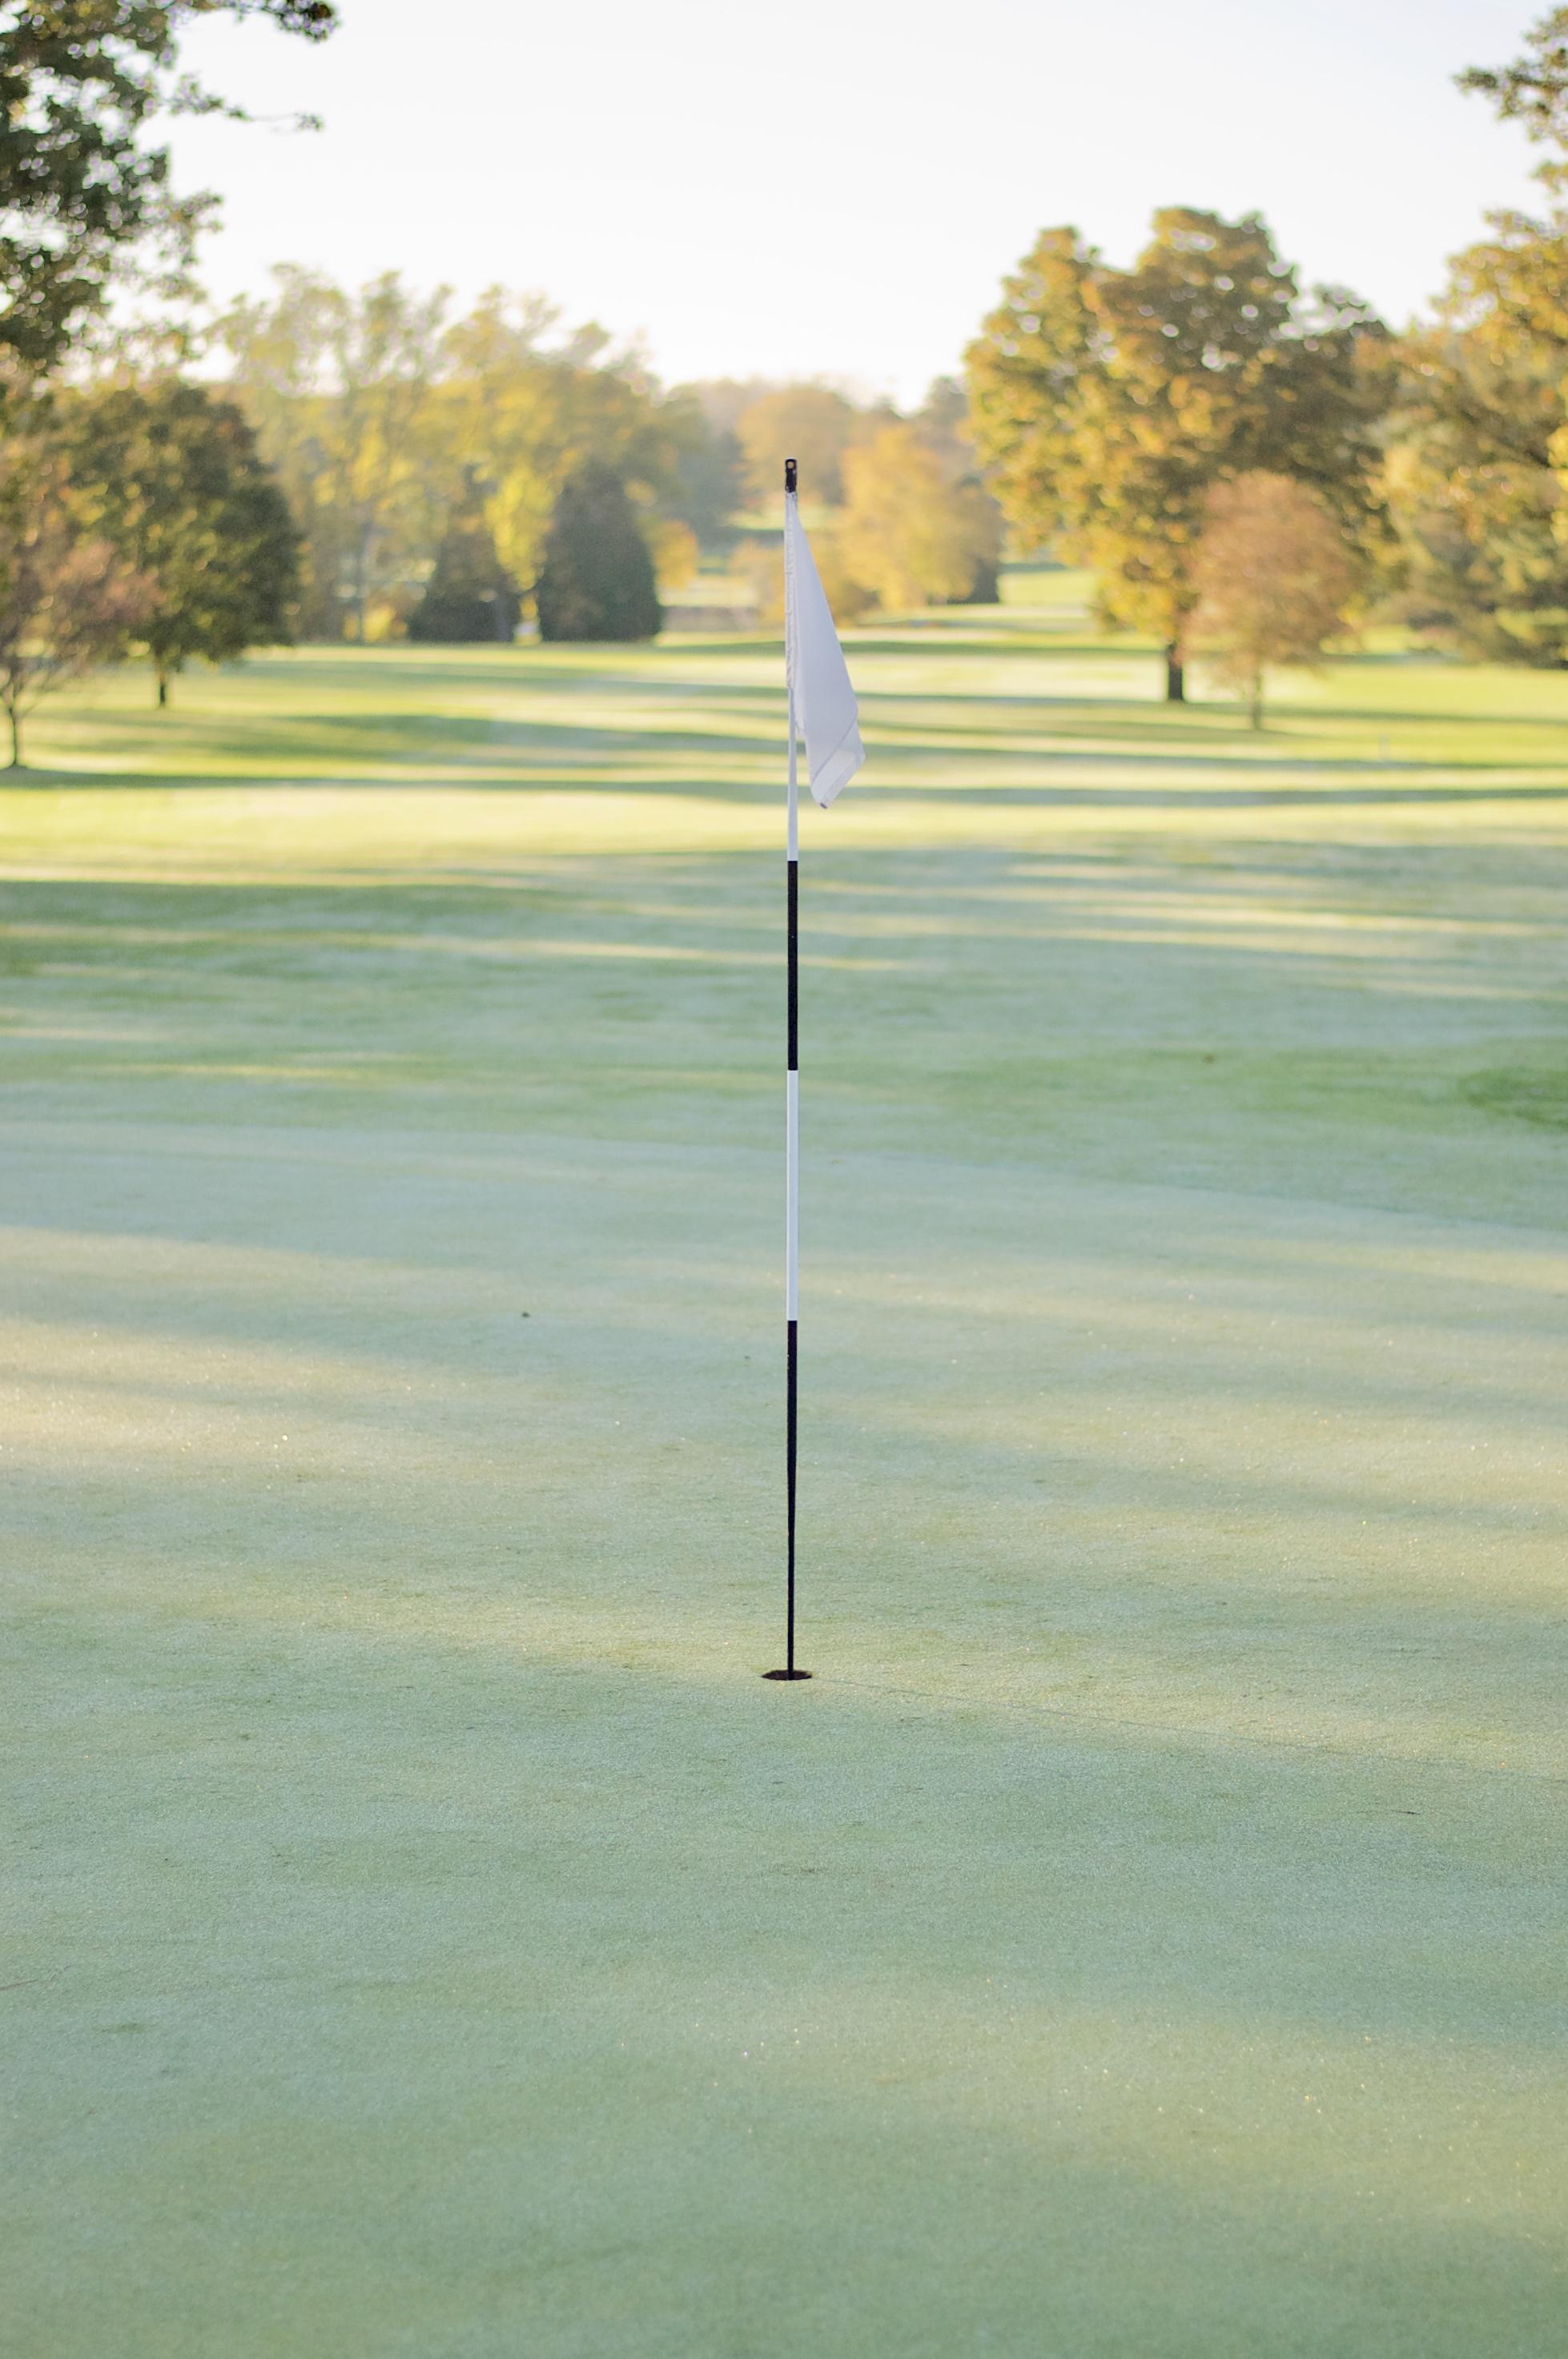 Fairway. Odana Hills Course. Madison, Wisconsin. October 2016. © William D. Walker